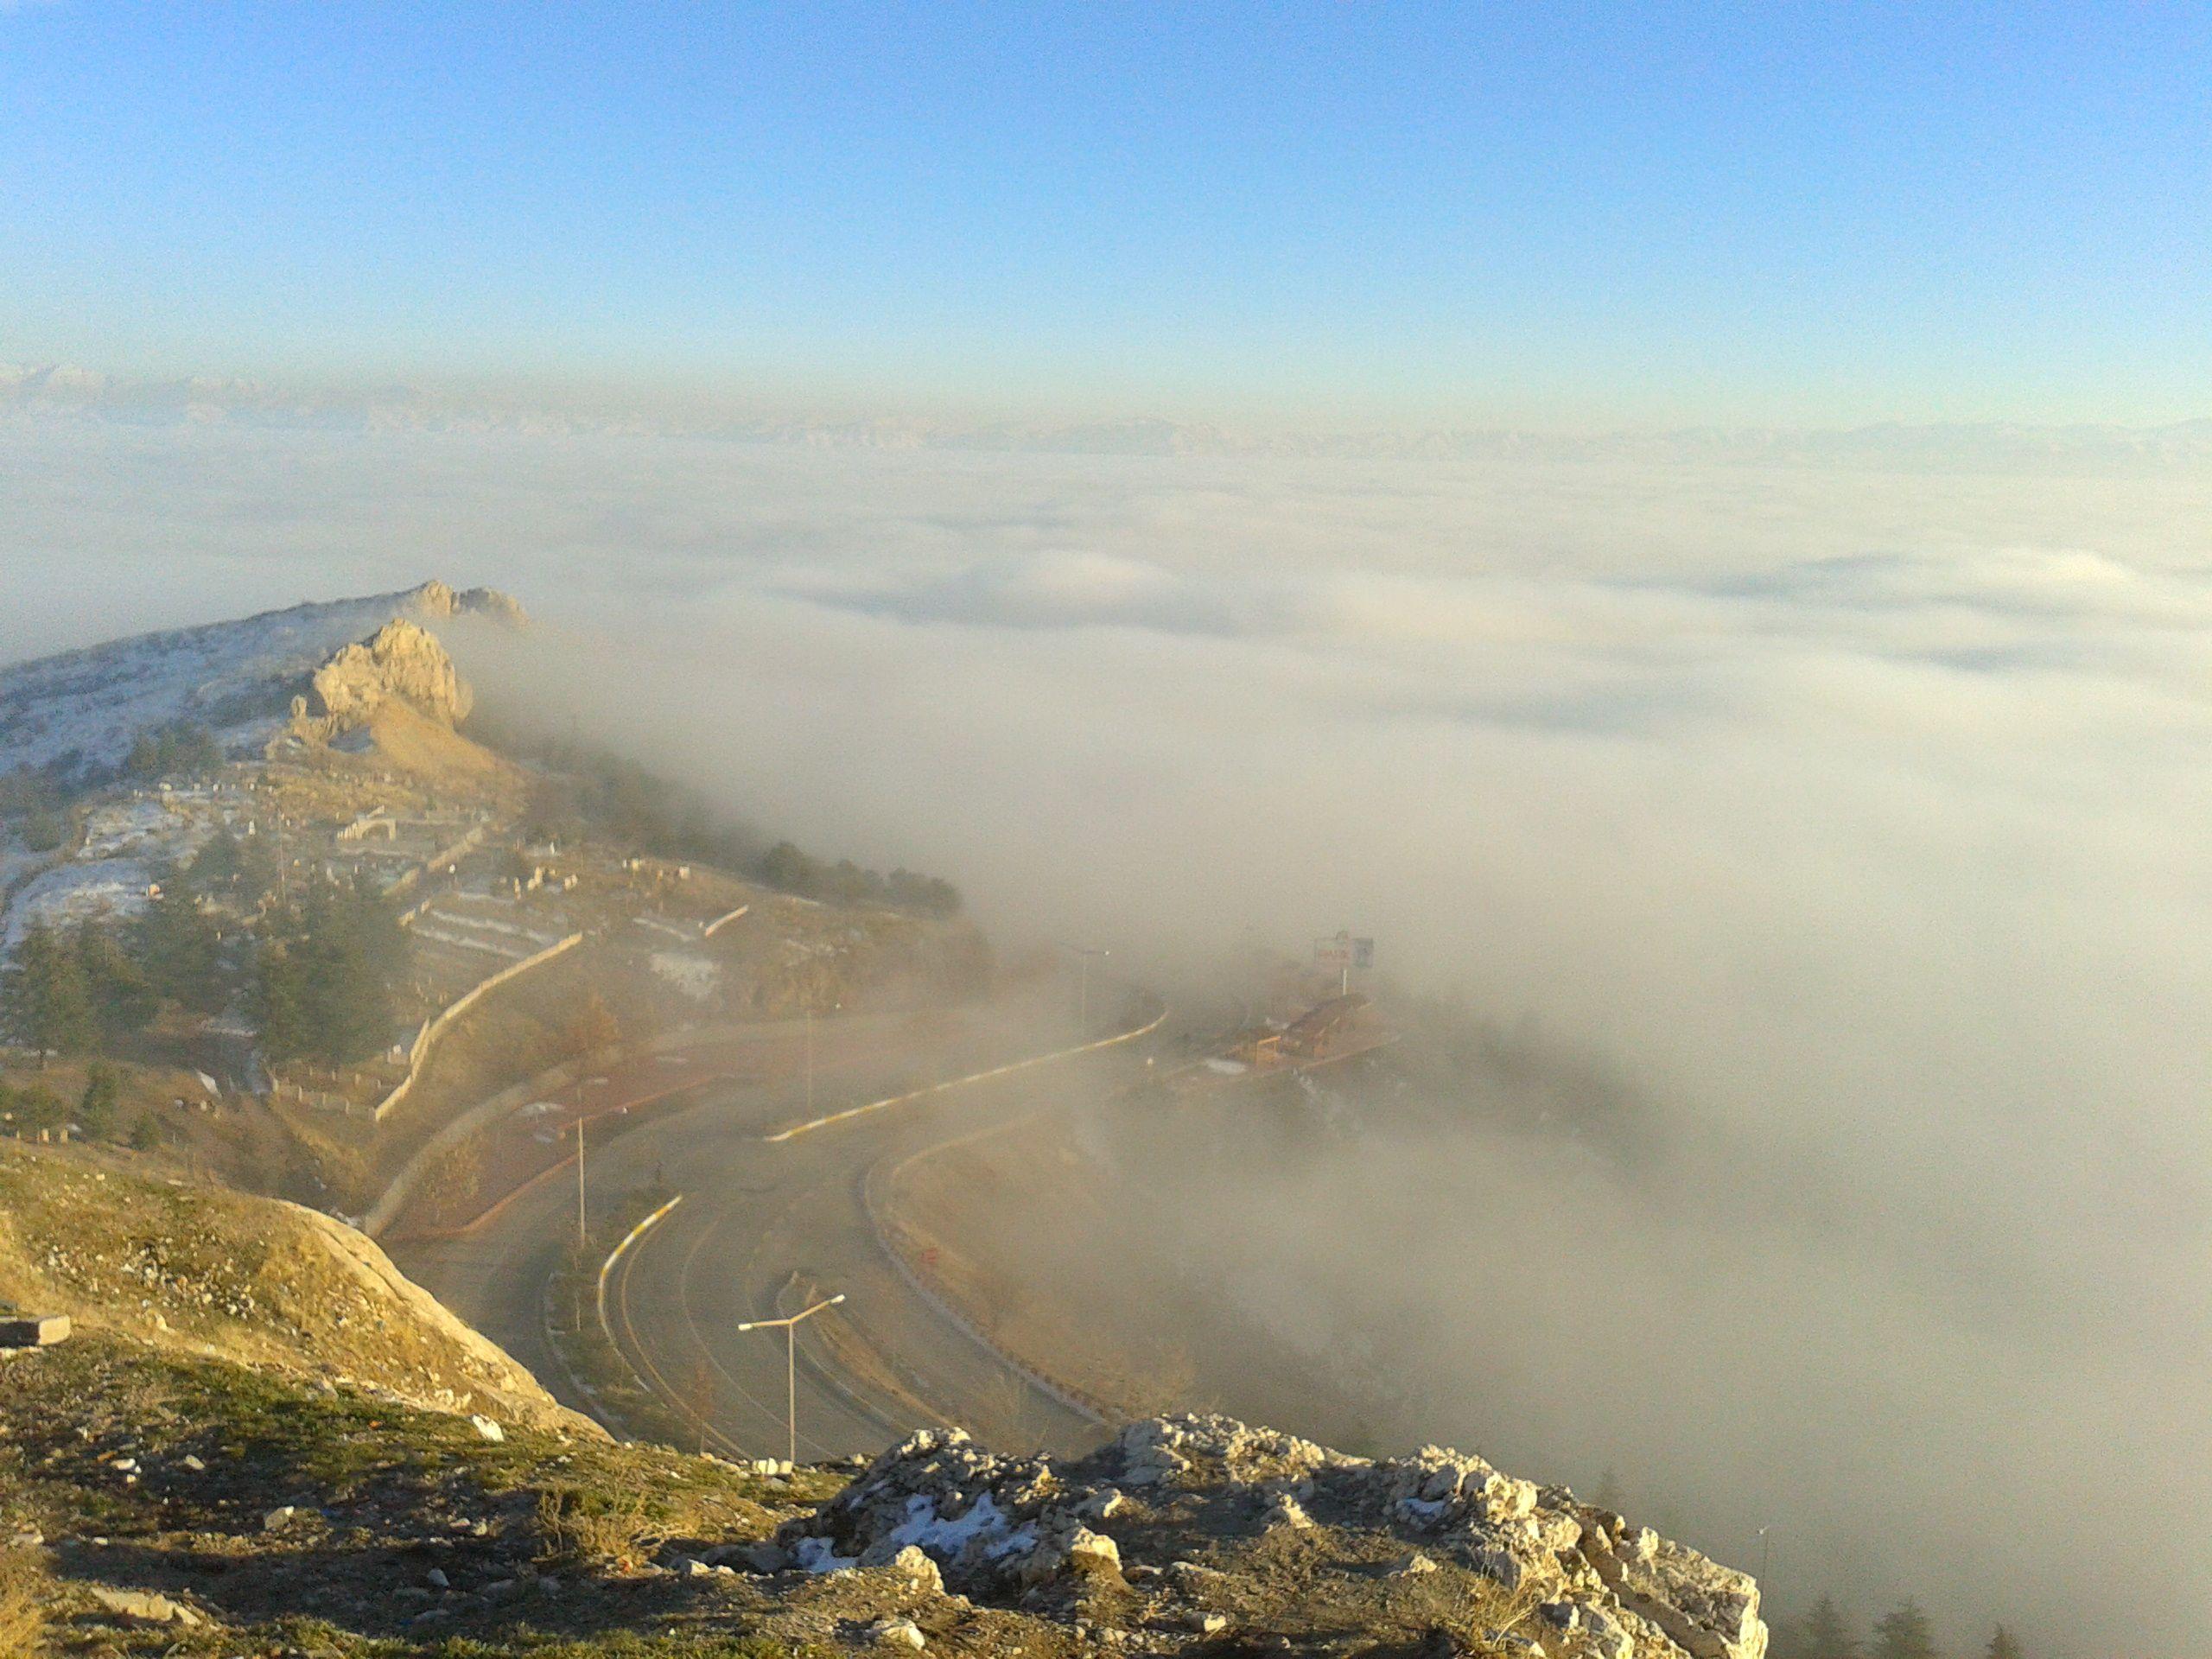 Elazig in the mist - from Harput, Elazig, Turkey.